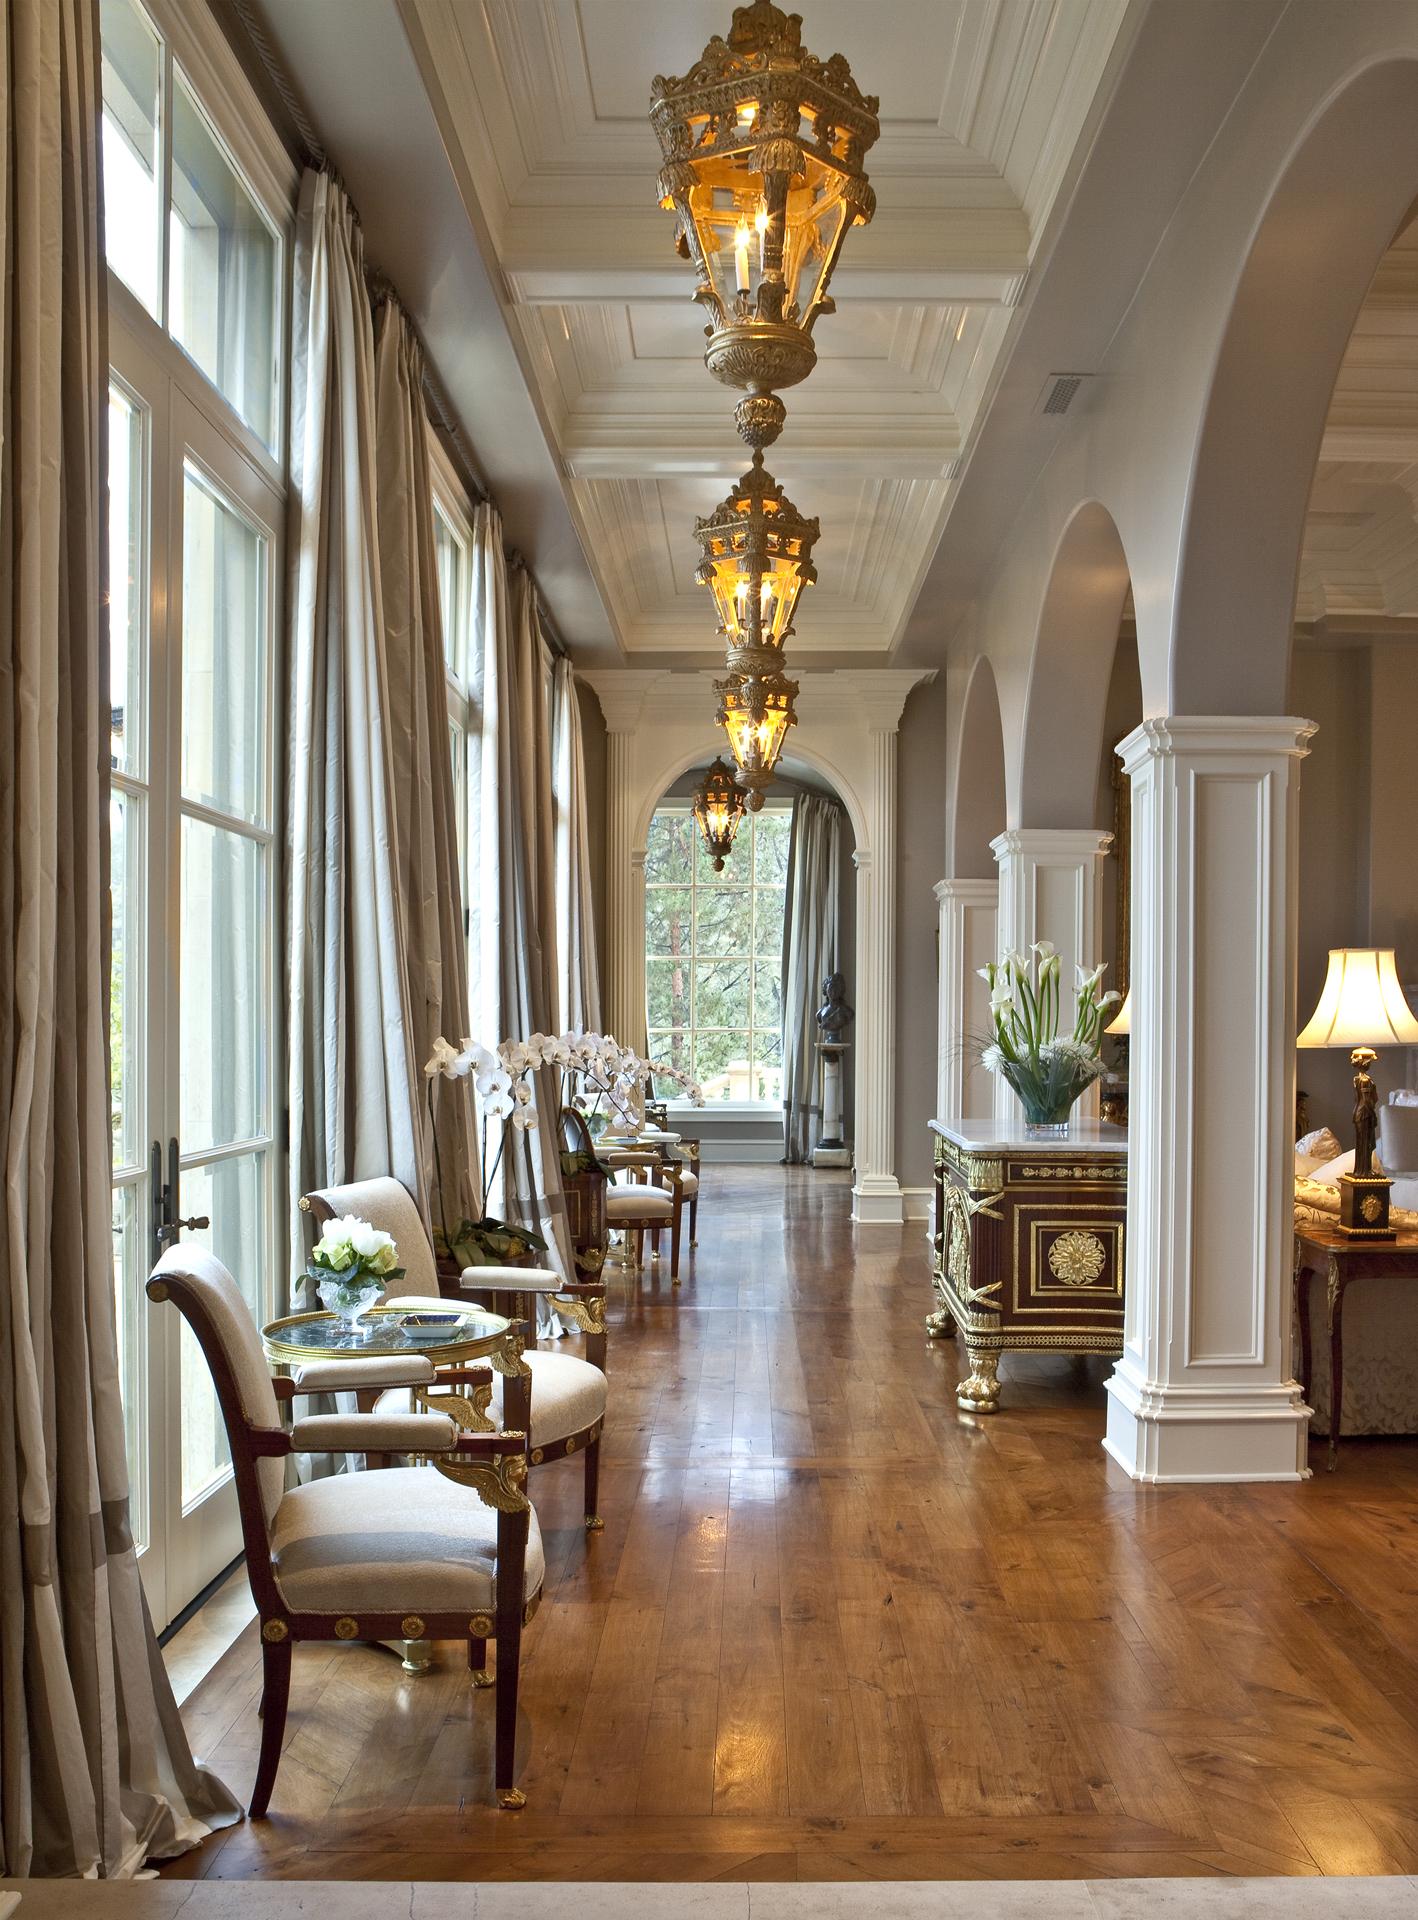 bel air country club bellagio interior interiors estate luxury million coldwell global banker designer coldwellbankerluxury